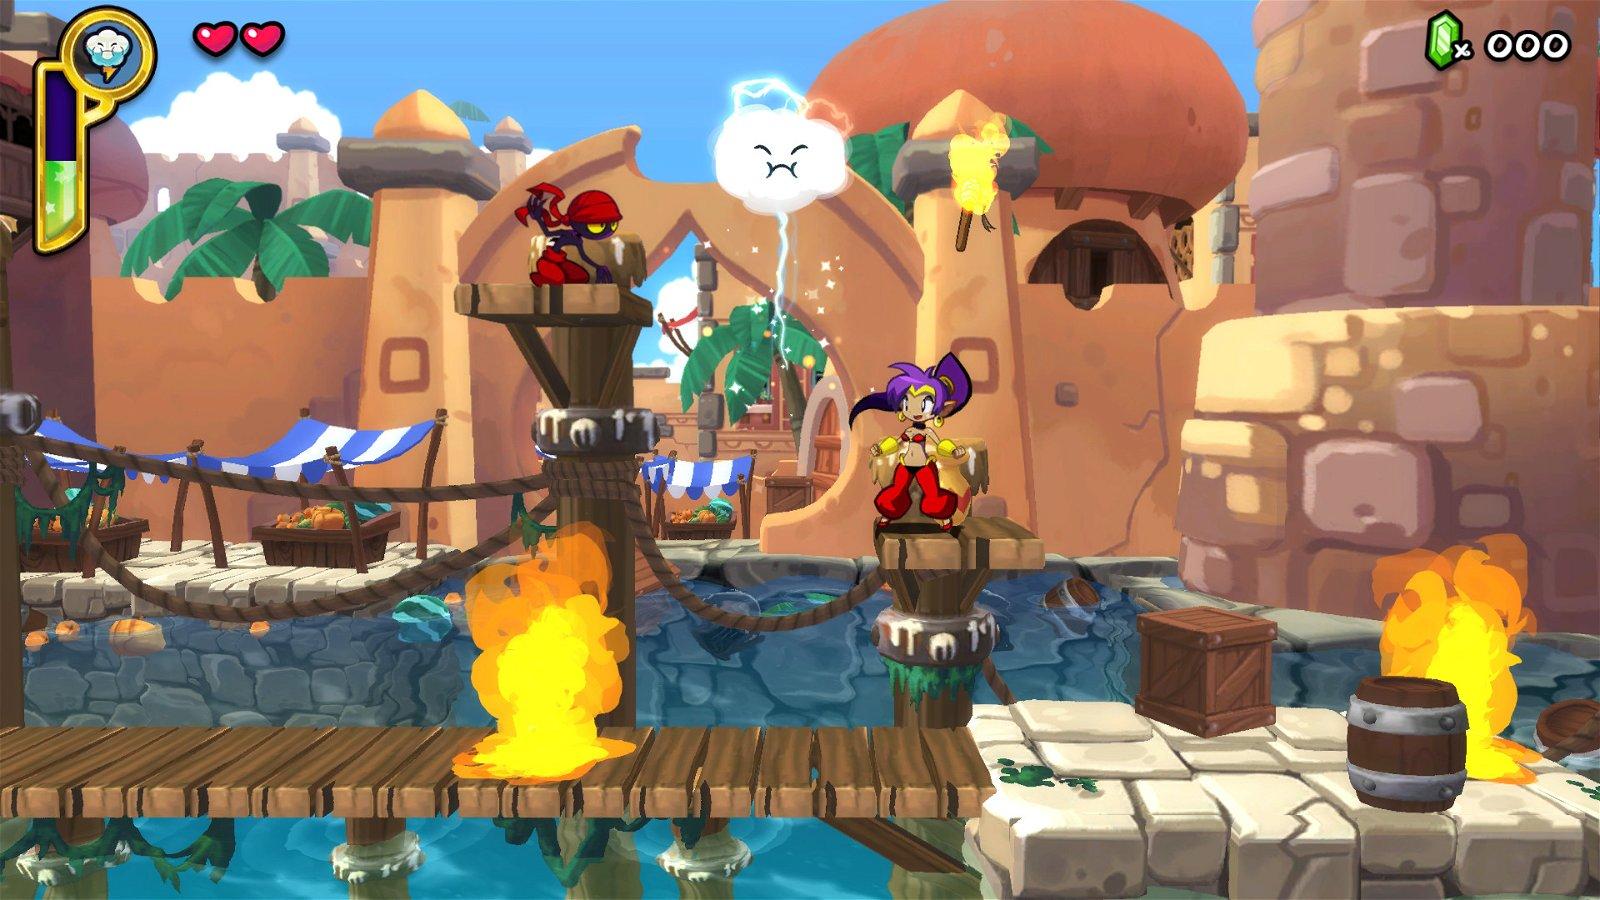 Shantae: Half-Genie Hero (Ps4) Review 9